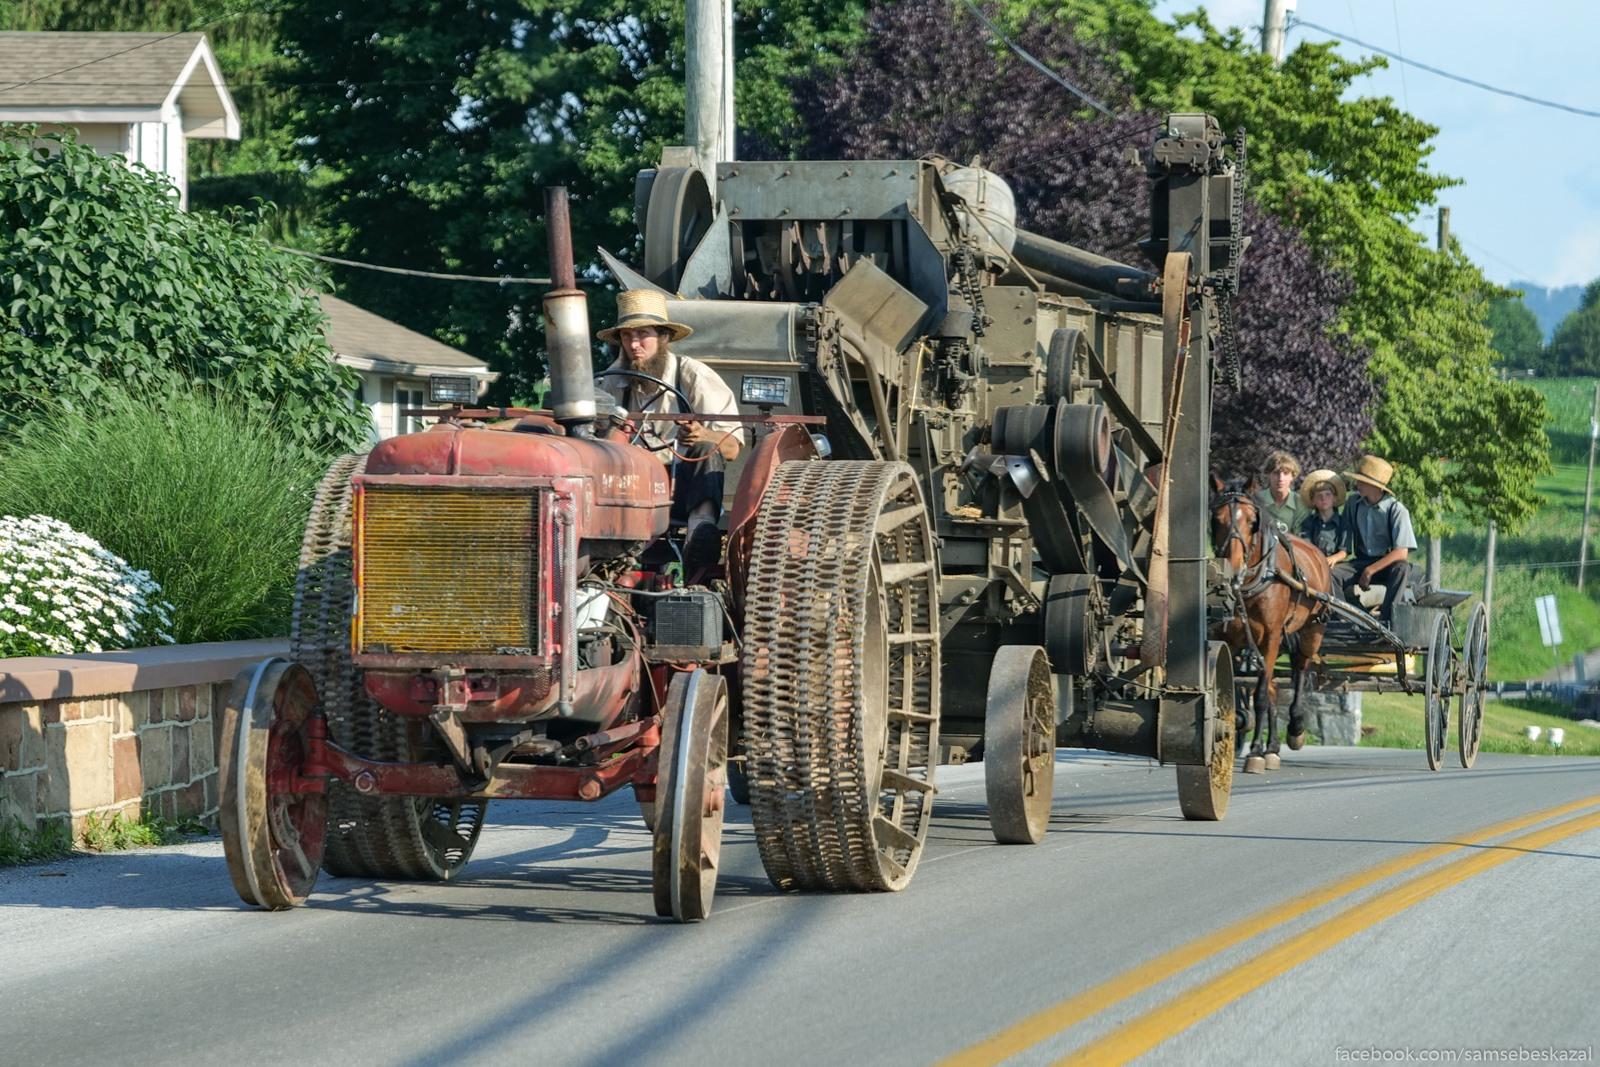 Amis edet na traktore...